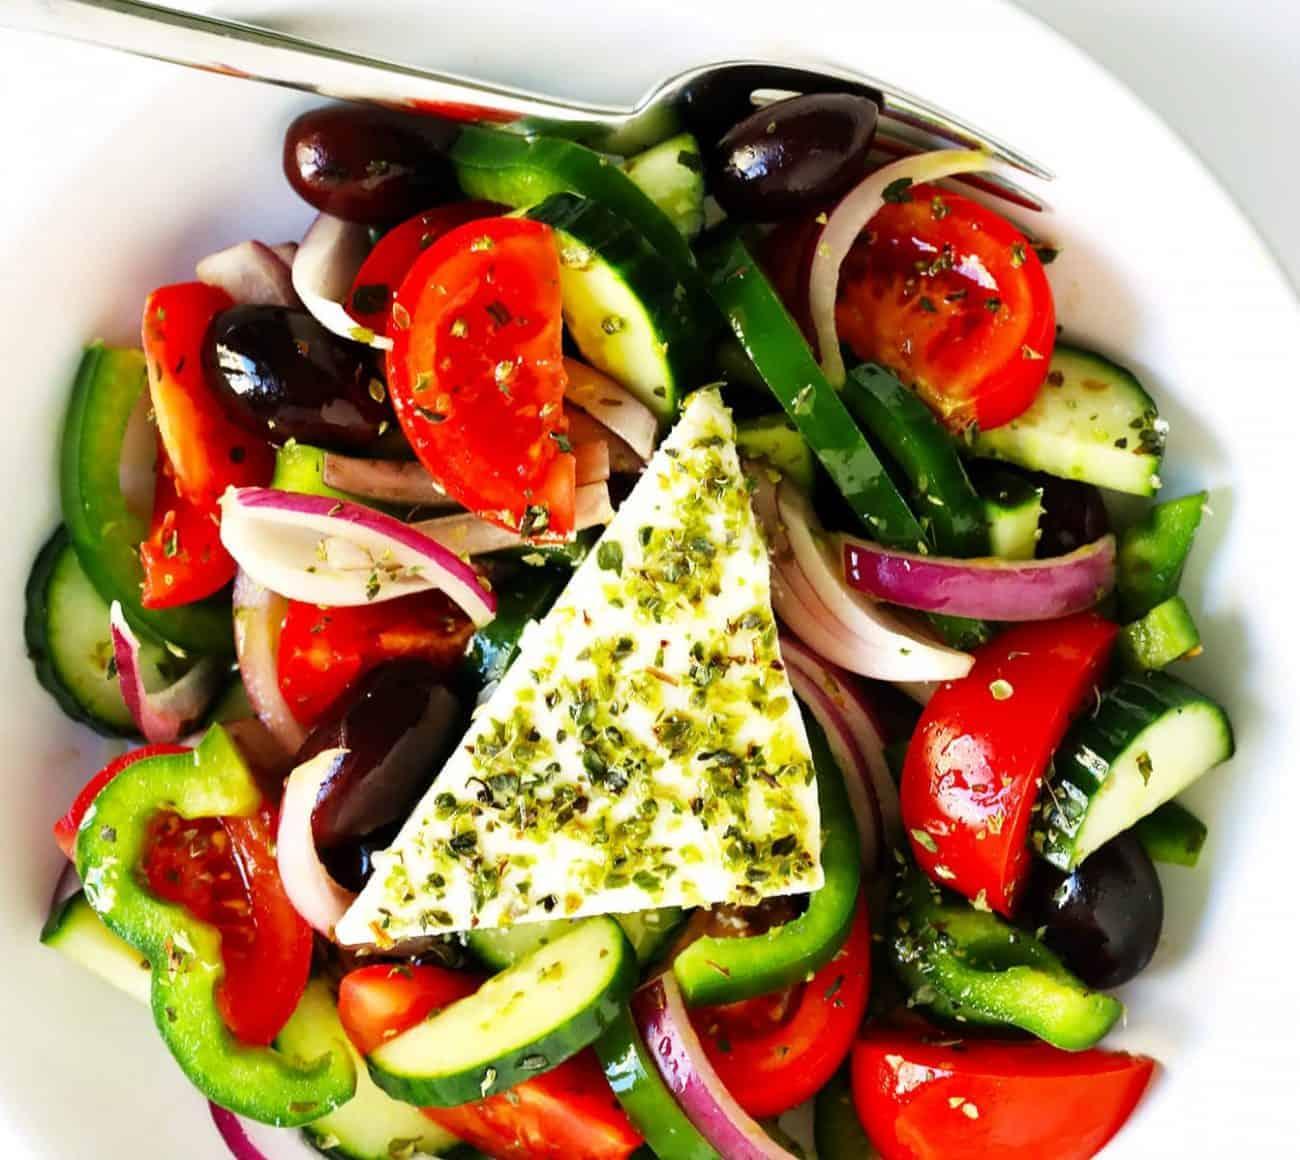 Griechischer Salat nach Originalrezept